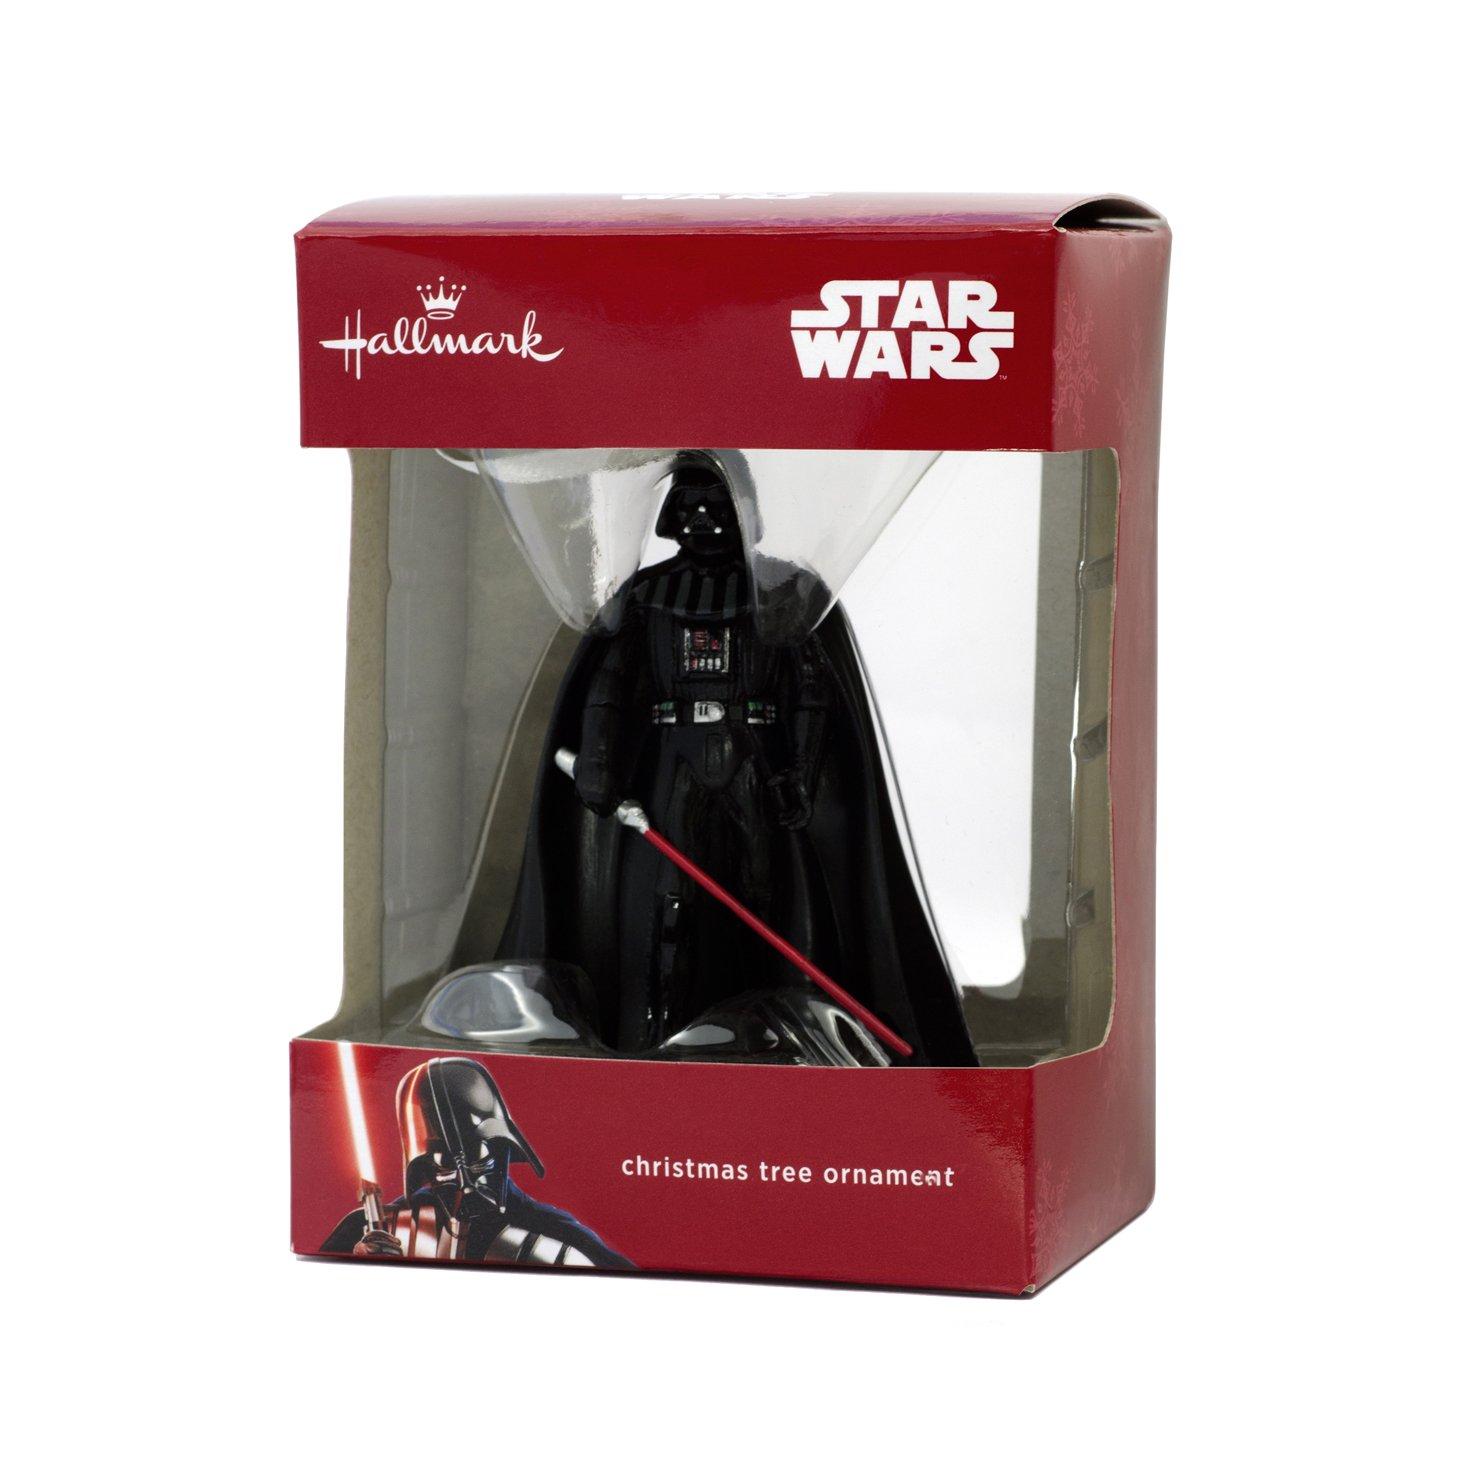 Amazon: Hallmark Star Wars Darth Vader Holiday Ornament: Home & Kitchen